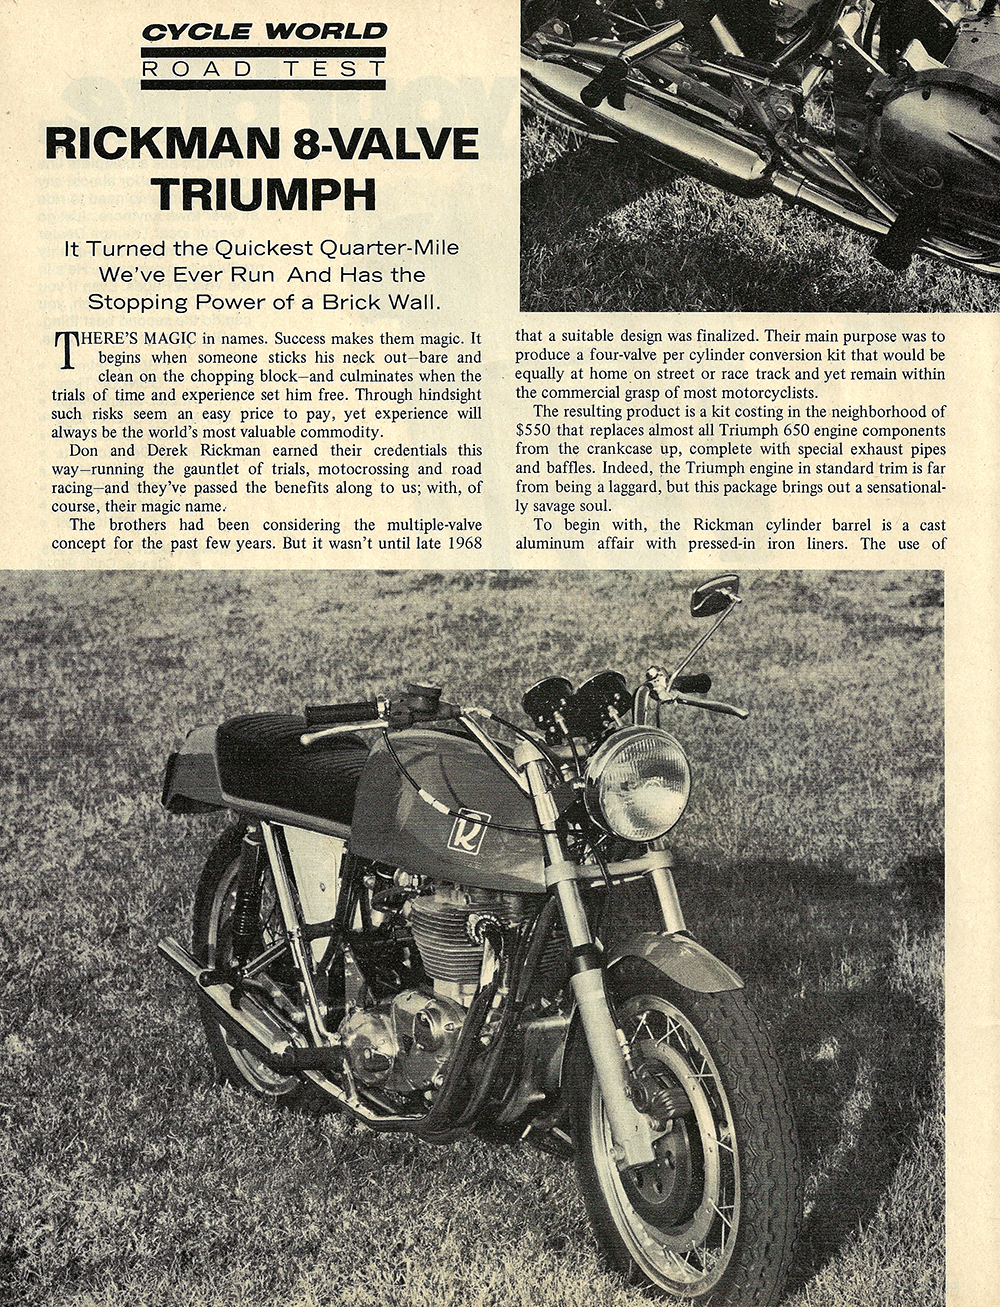 1970 Rickman 8 valve Triumph road test 01.jpg